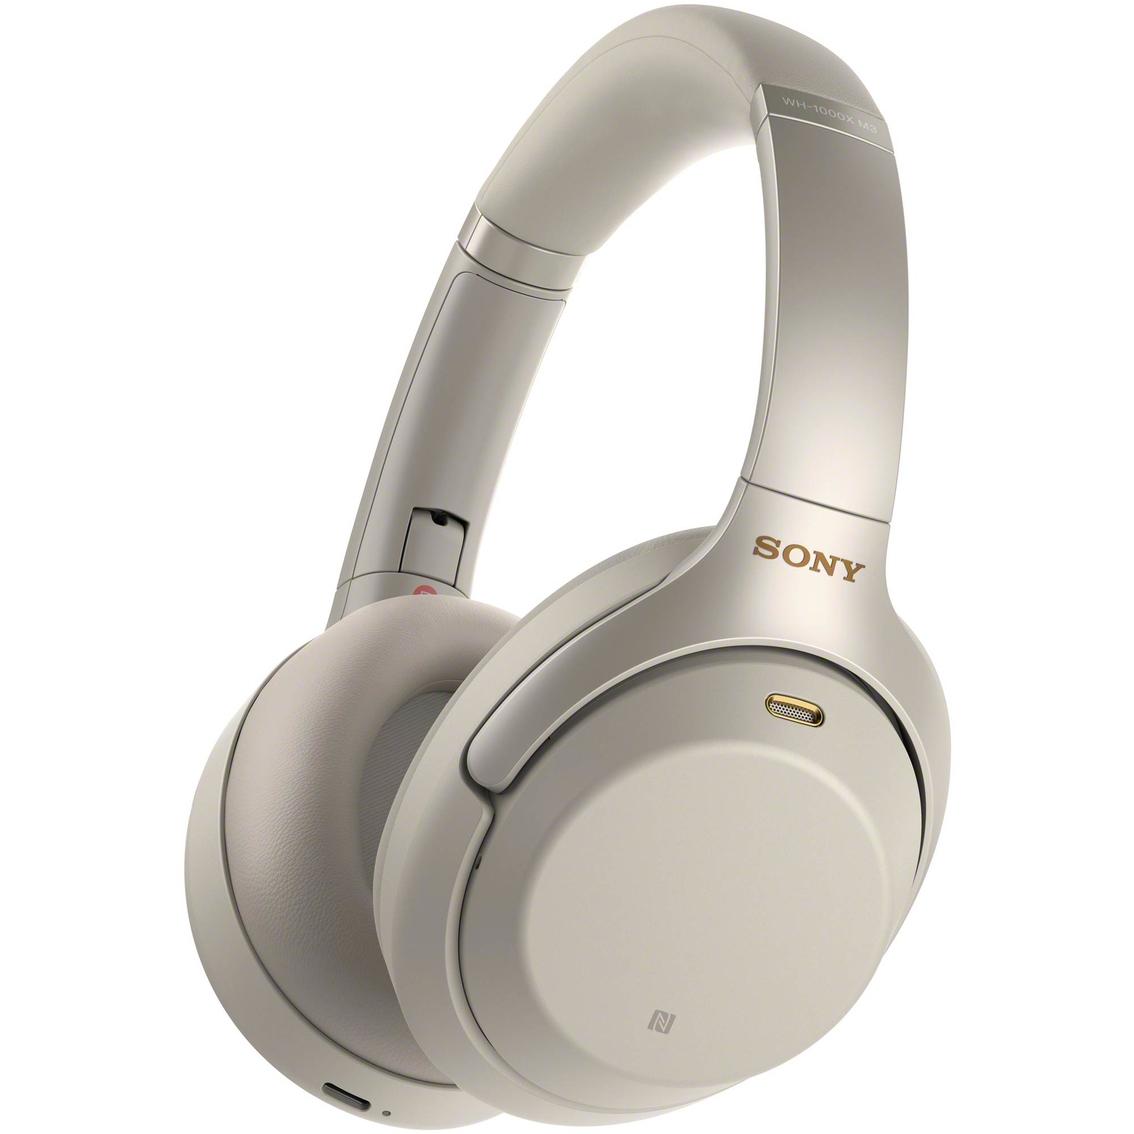 Sony Wireless Noise Cancelling Headphones Headphones Microphones Electronics Shop The Exchange